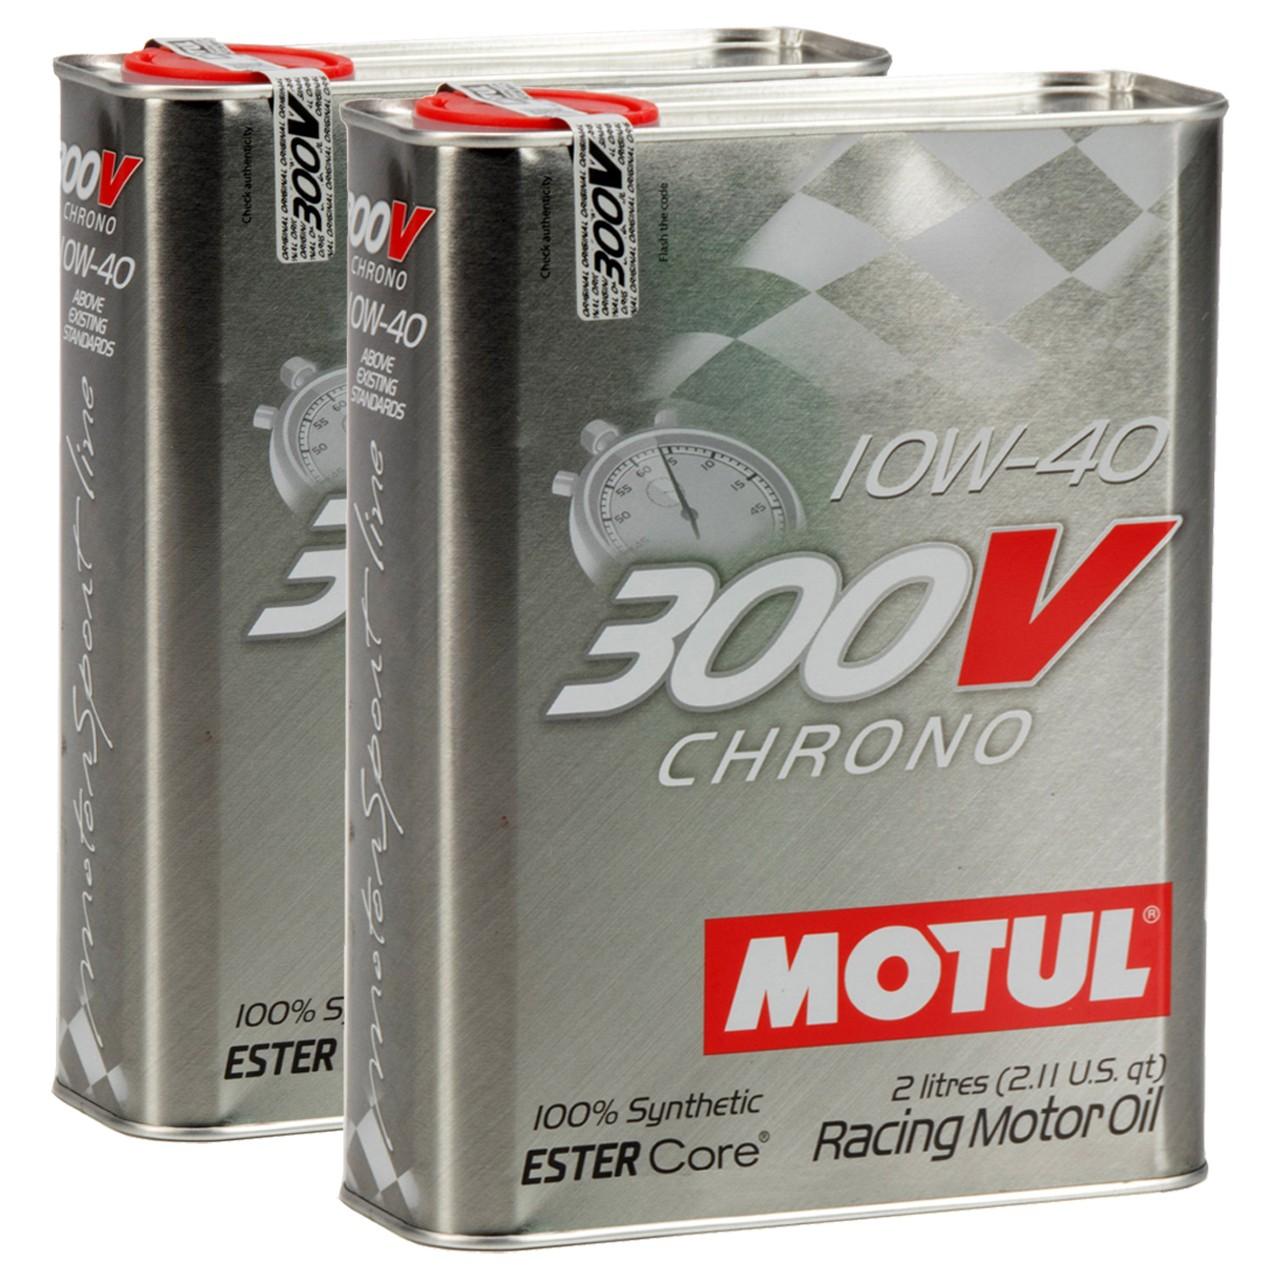 MOTUL 300V CHRONO Motoröl Öl 10W40 100% Synthetic Ester Core - 4L 4 Liter